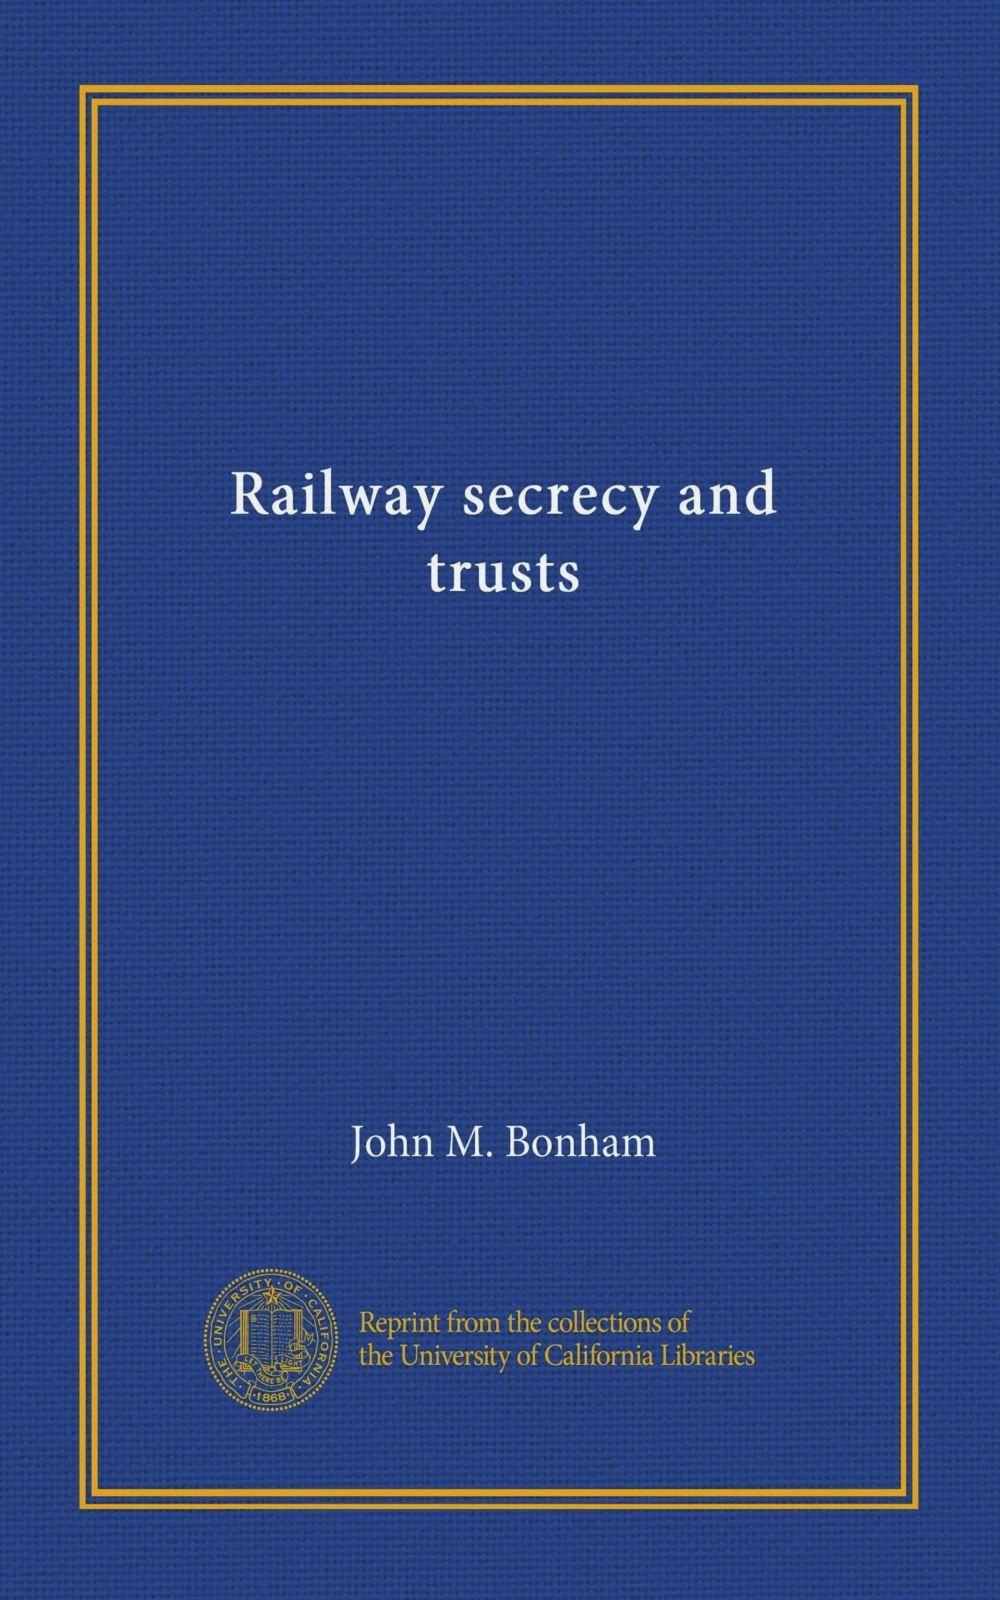 Railway secrecy and trusts